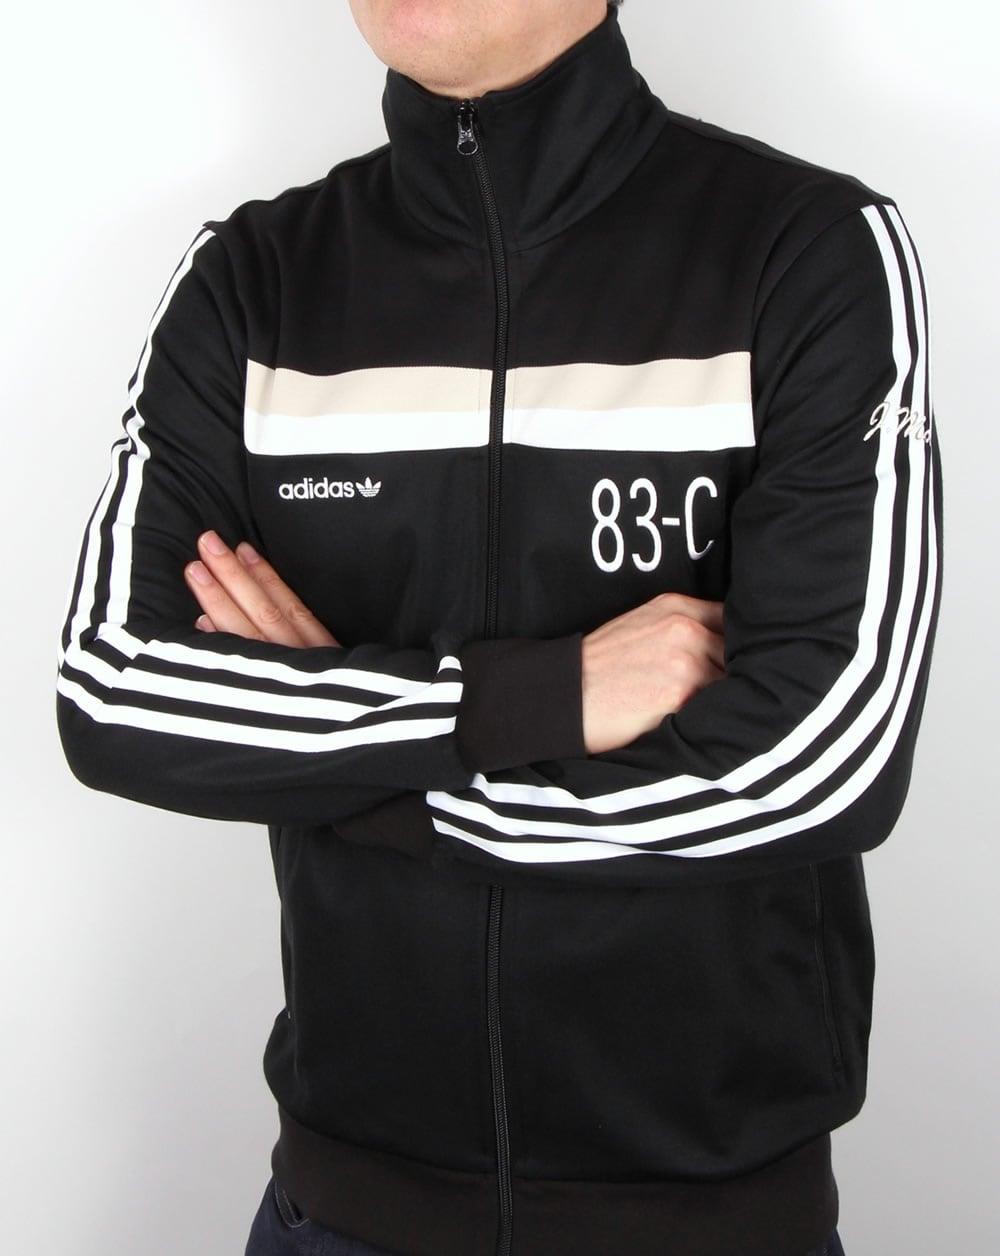 ff727cd472b5 Adidas Originals 83-C Track Top Black,tracksuit,jacket,mens